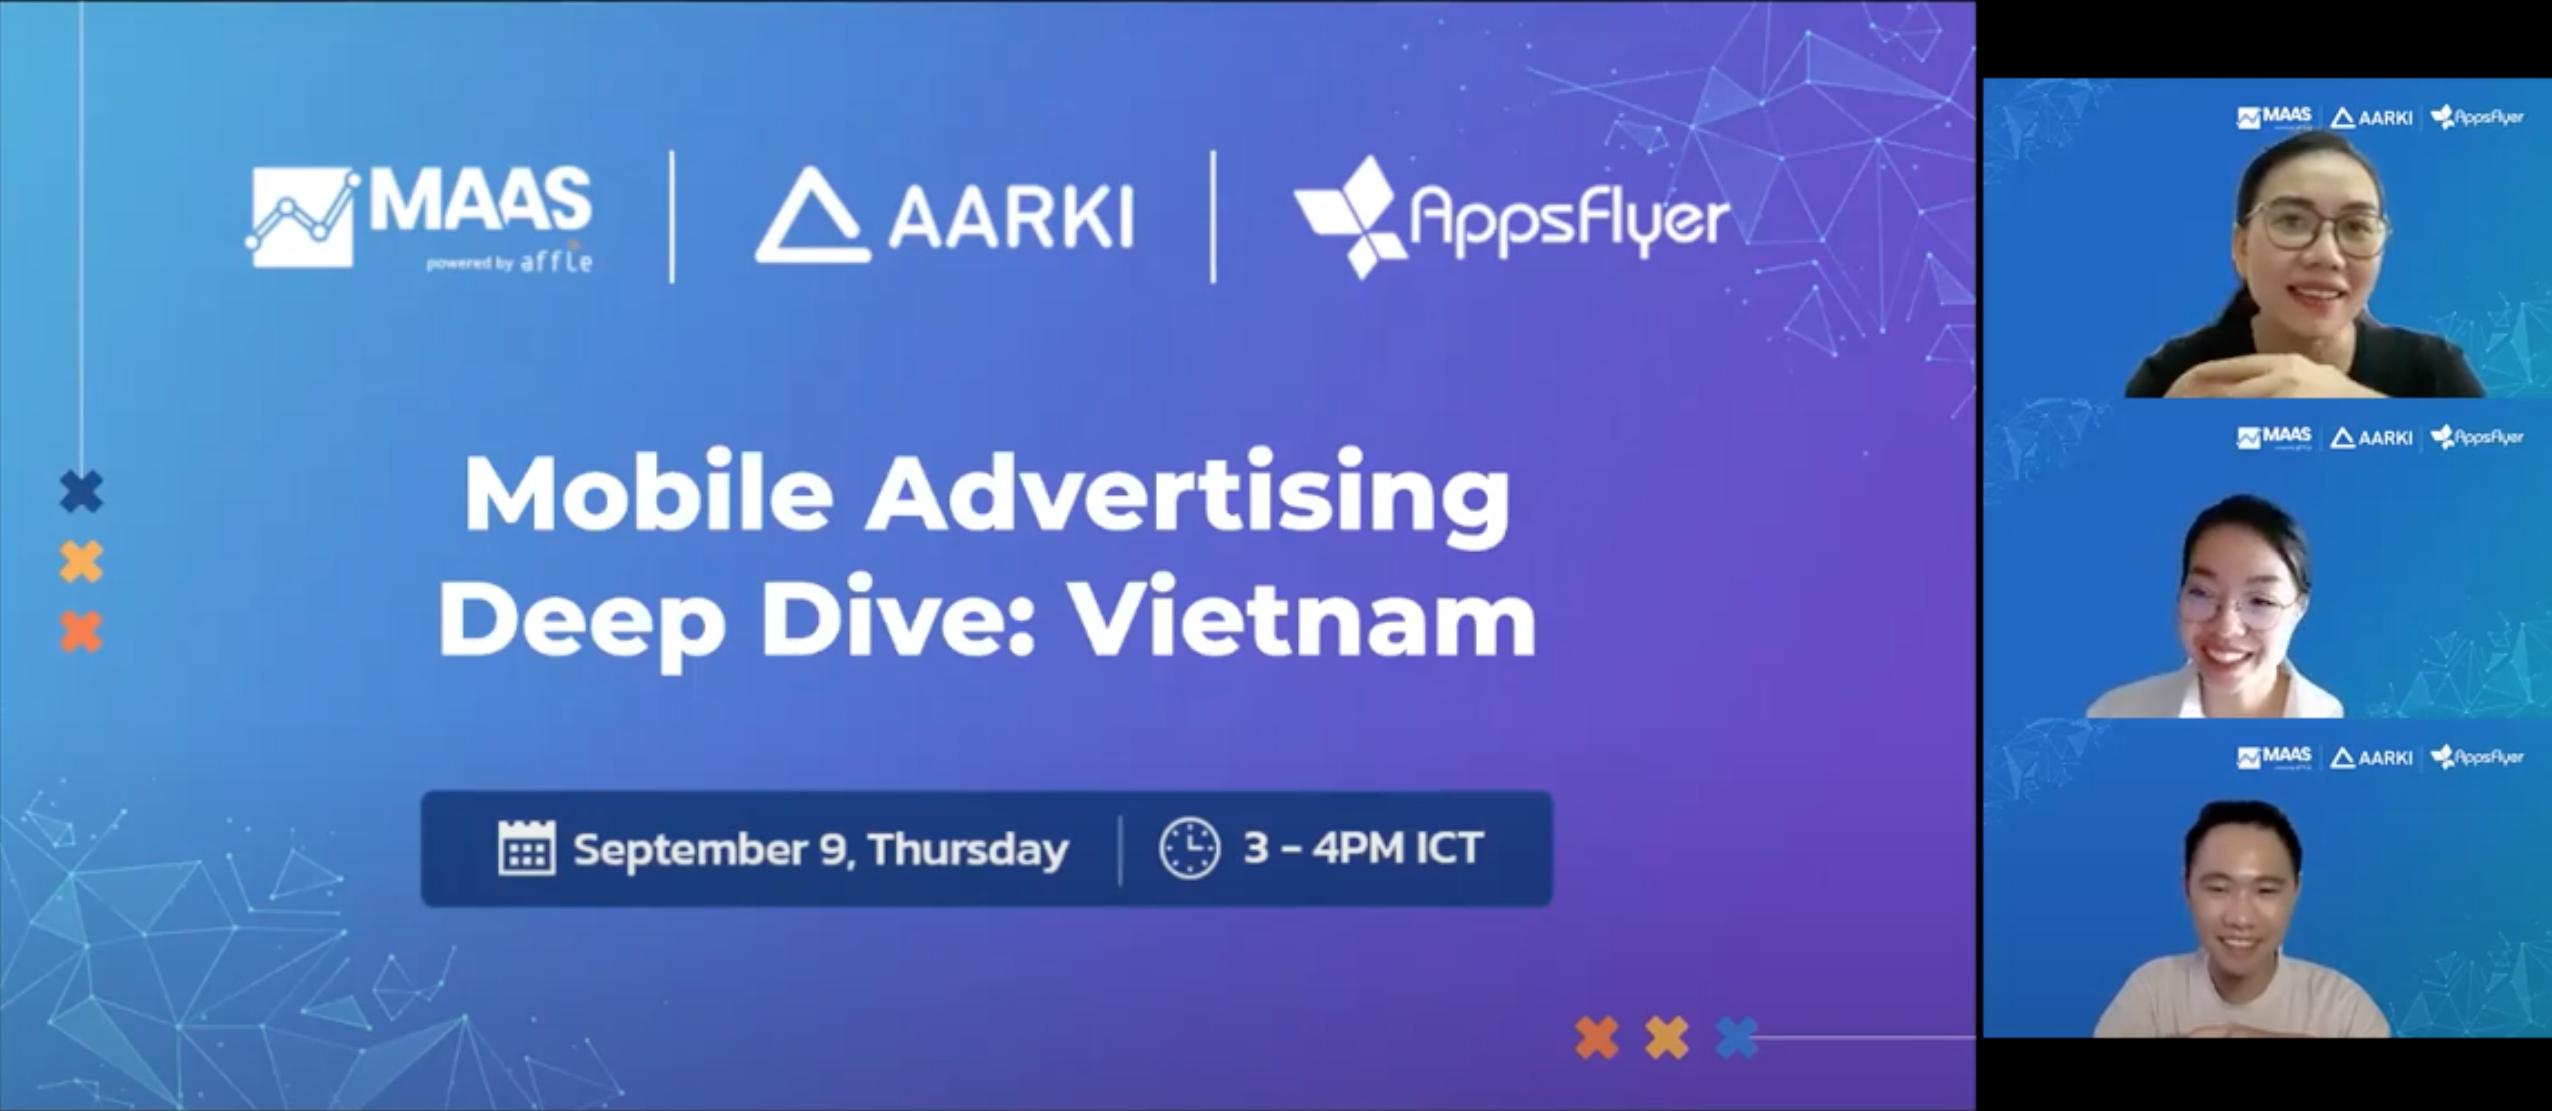 Mobile Advertising Deep Dive Vietnam Aarki MAAS by Affle AppsFlyer Tri Huynh Dung Nguyen KC Nguyen